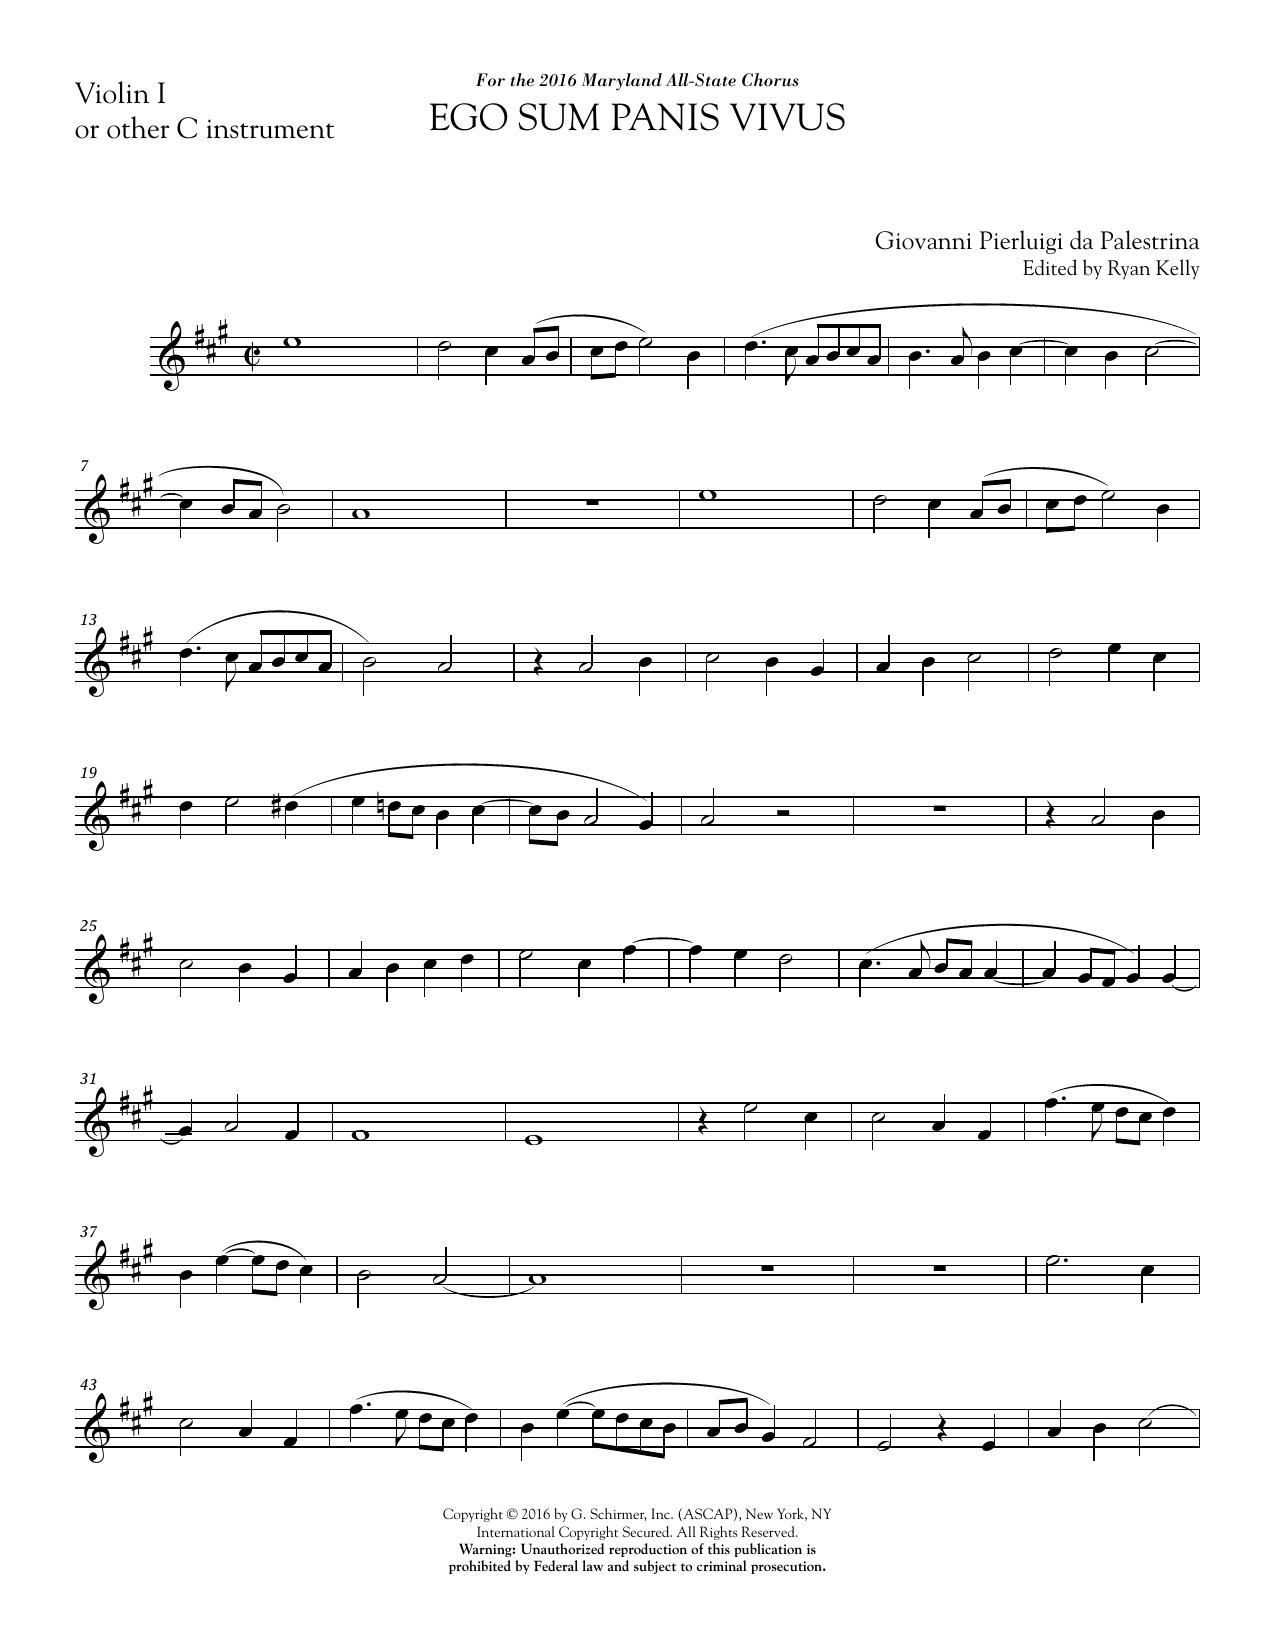 Ego sum panis vivus (ed. Ryan Kelly) - Violin 1 Sheet Music